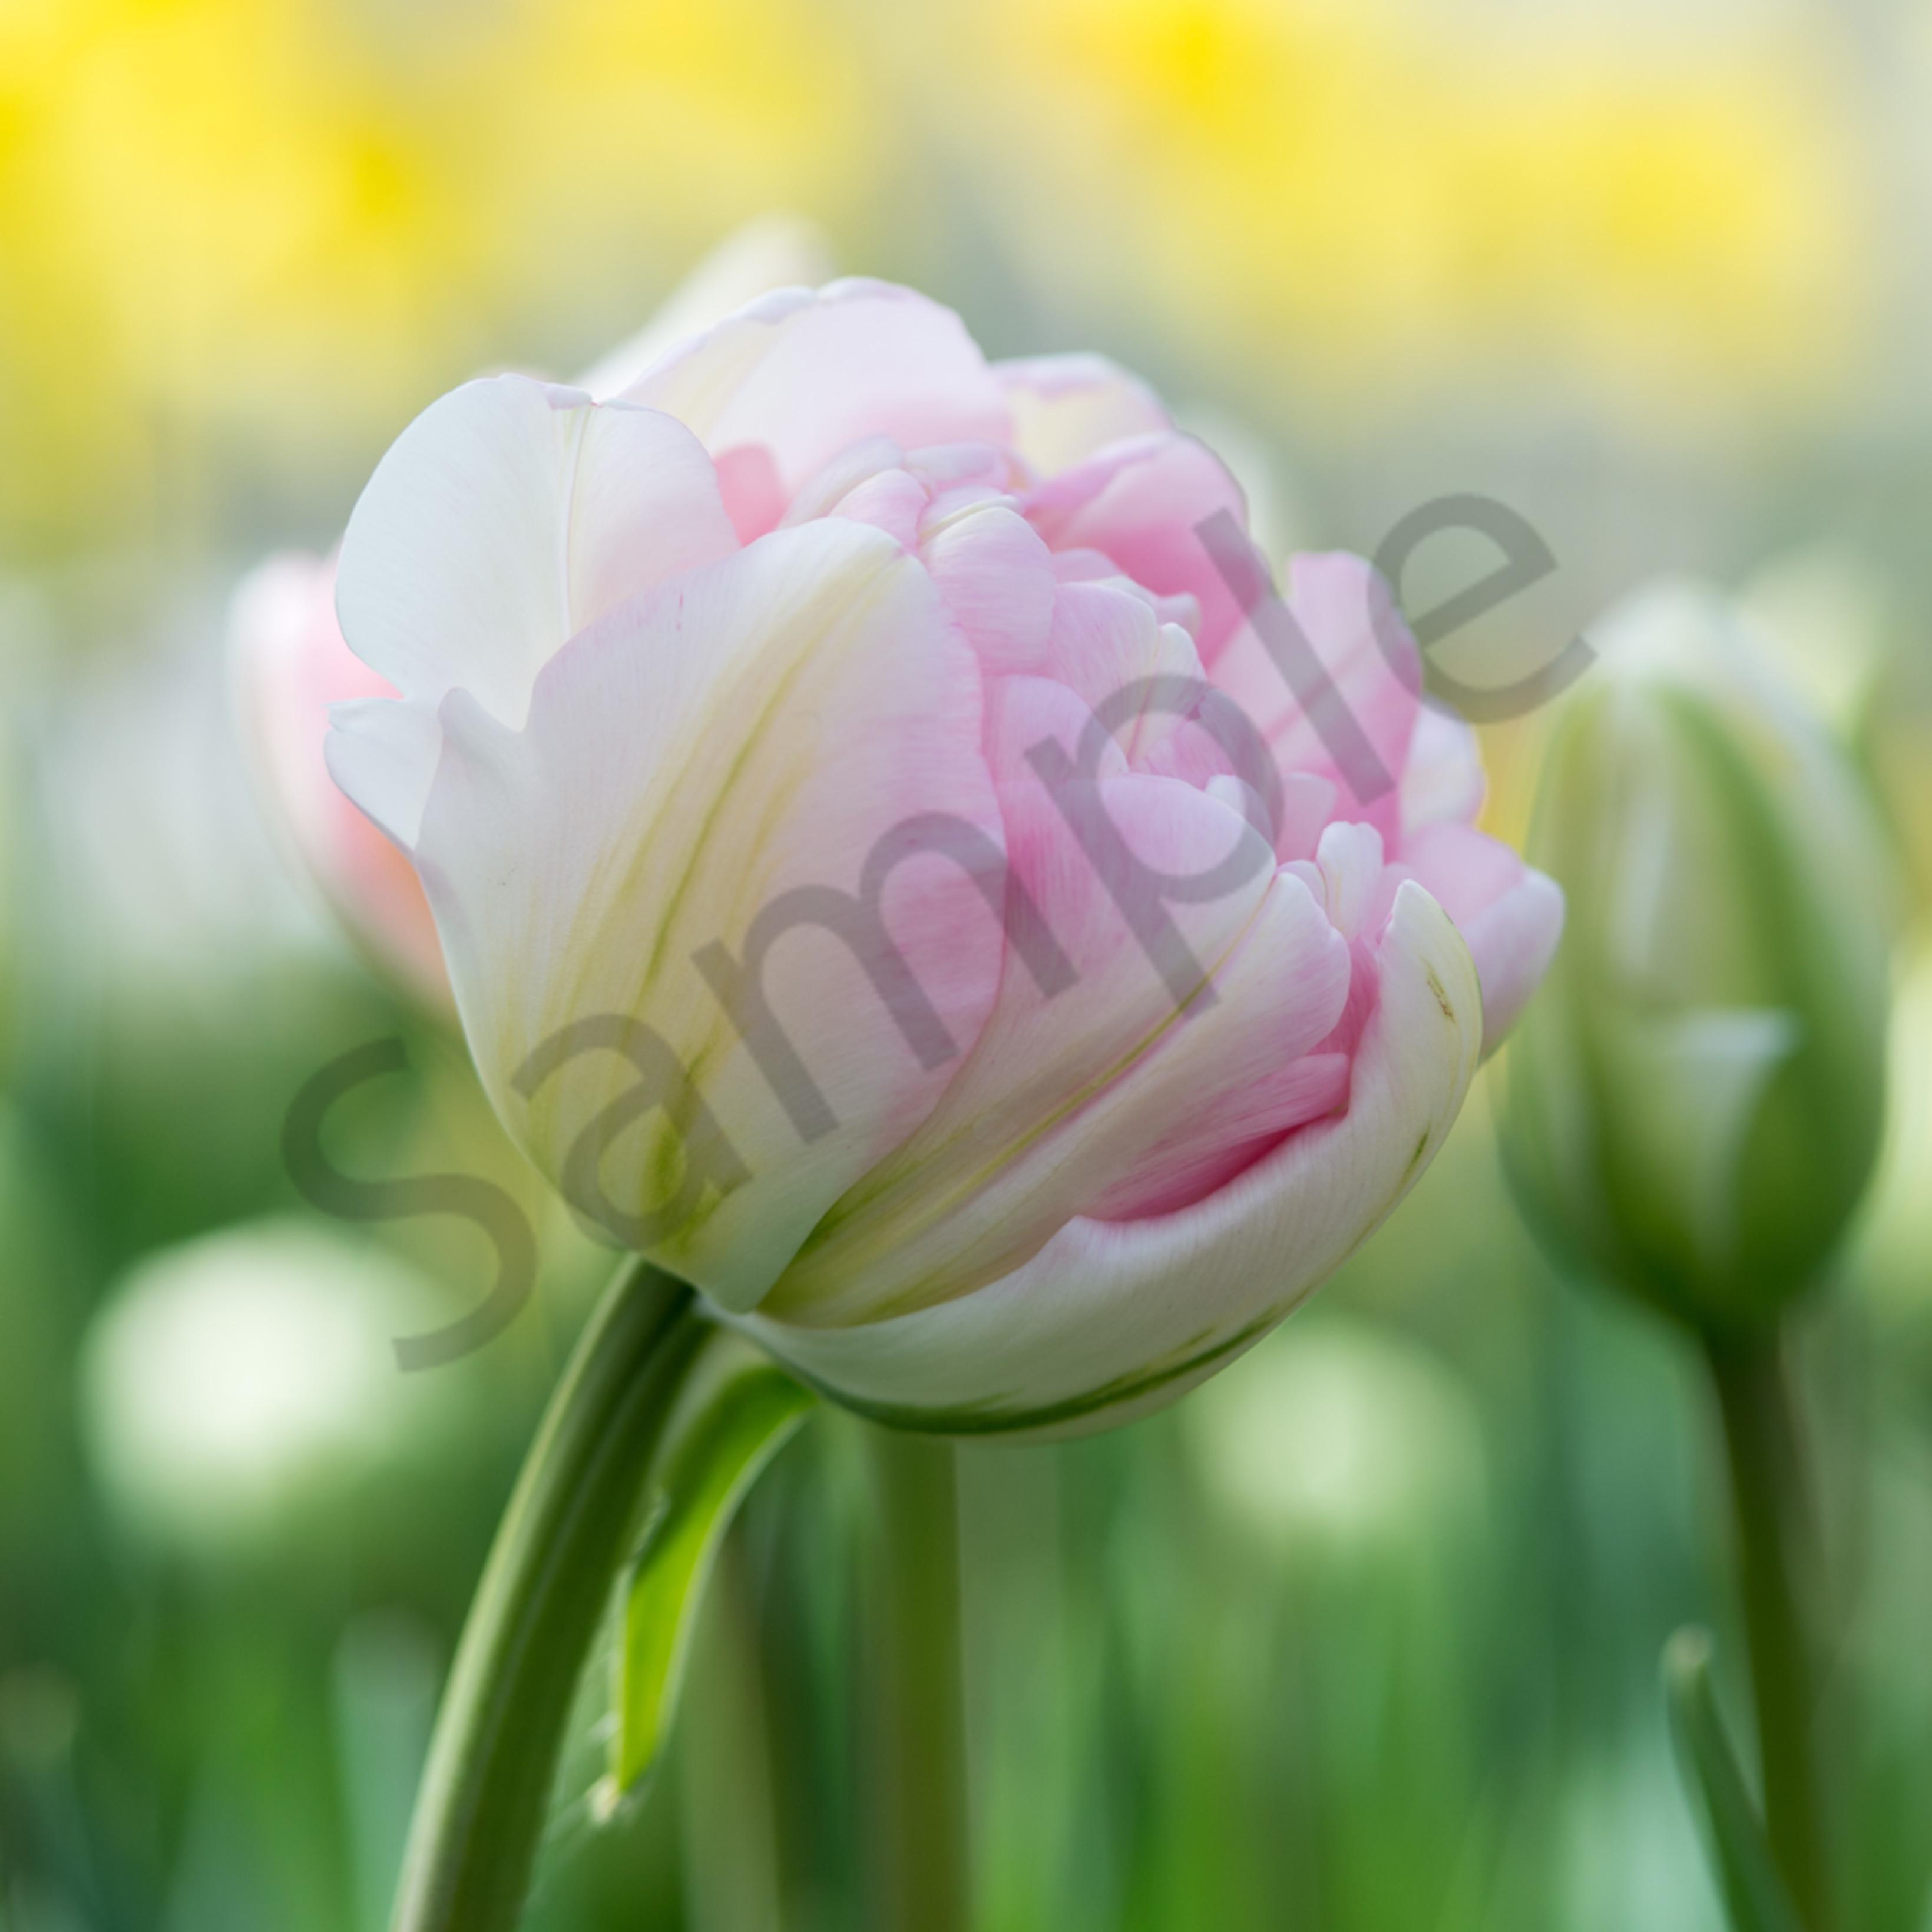 Tulips 2 mi61ze